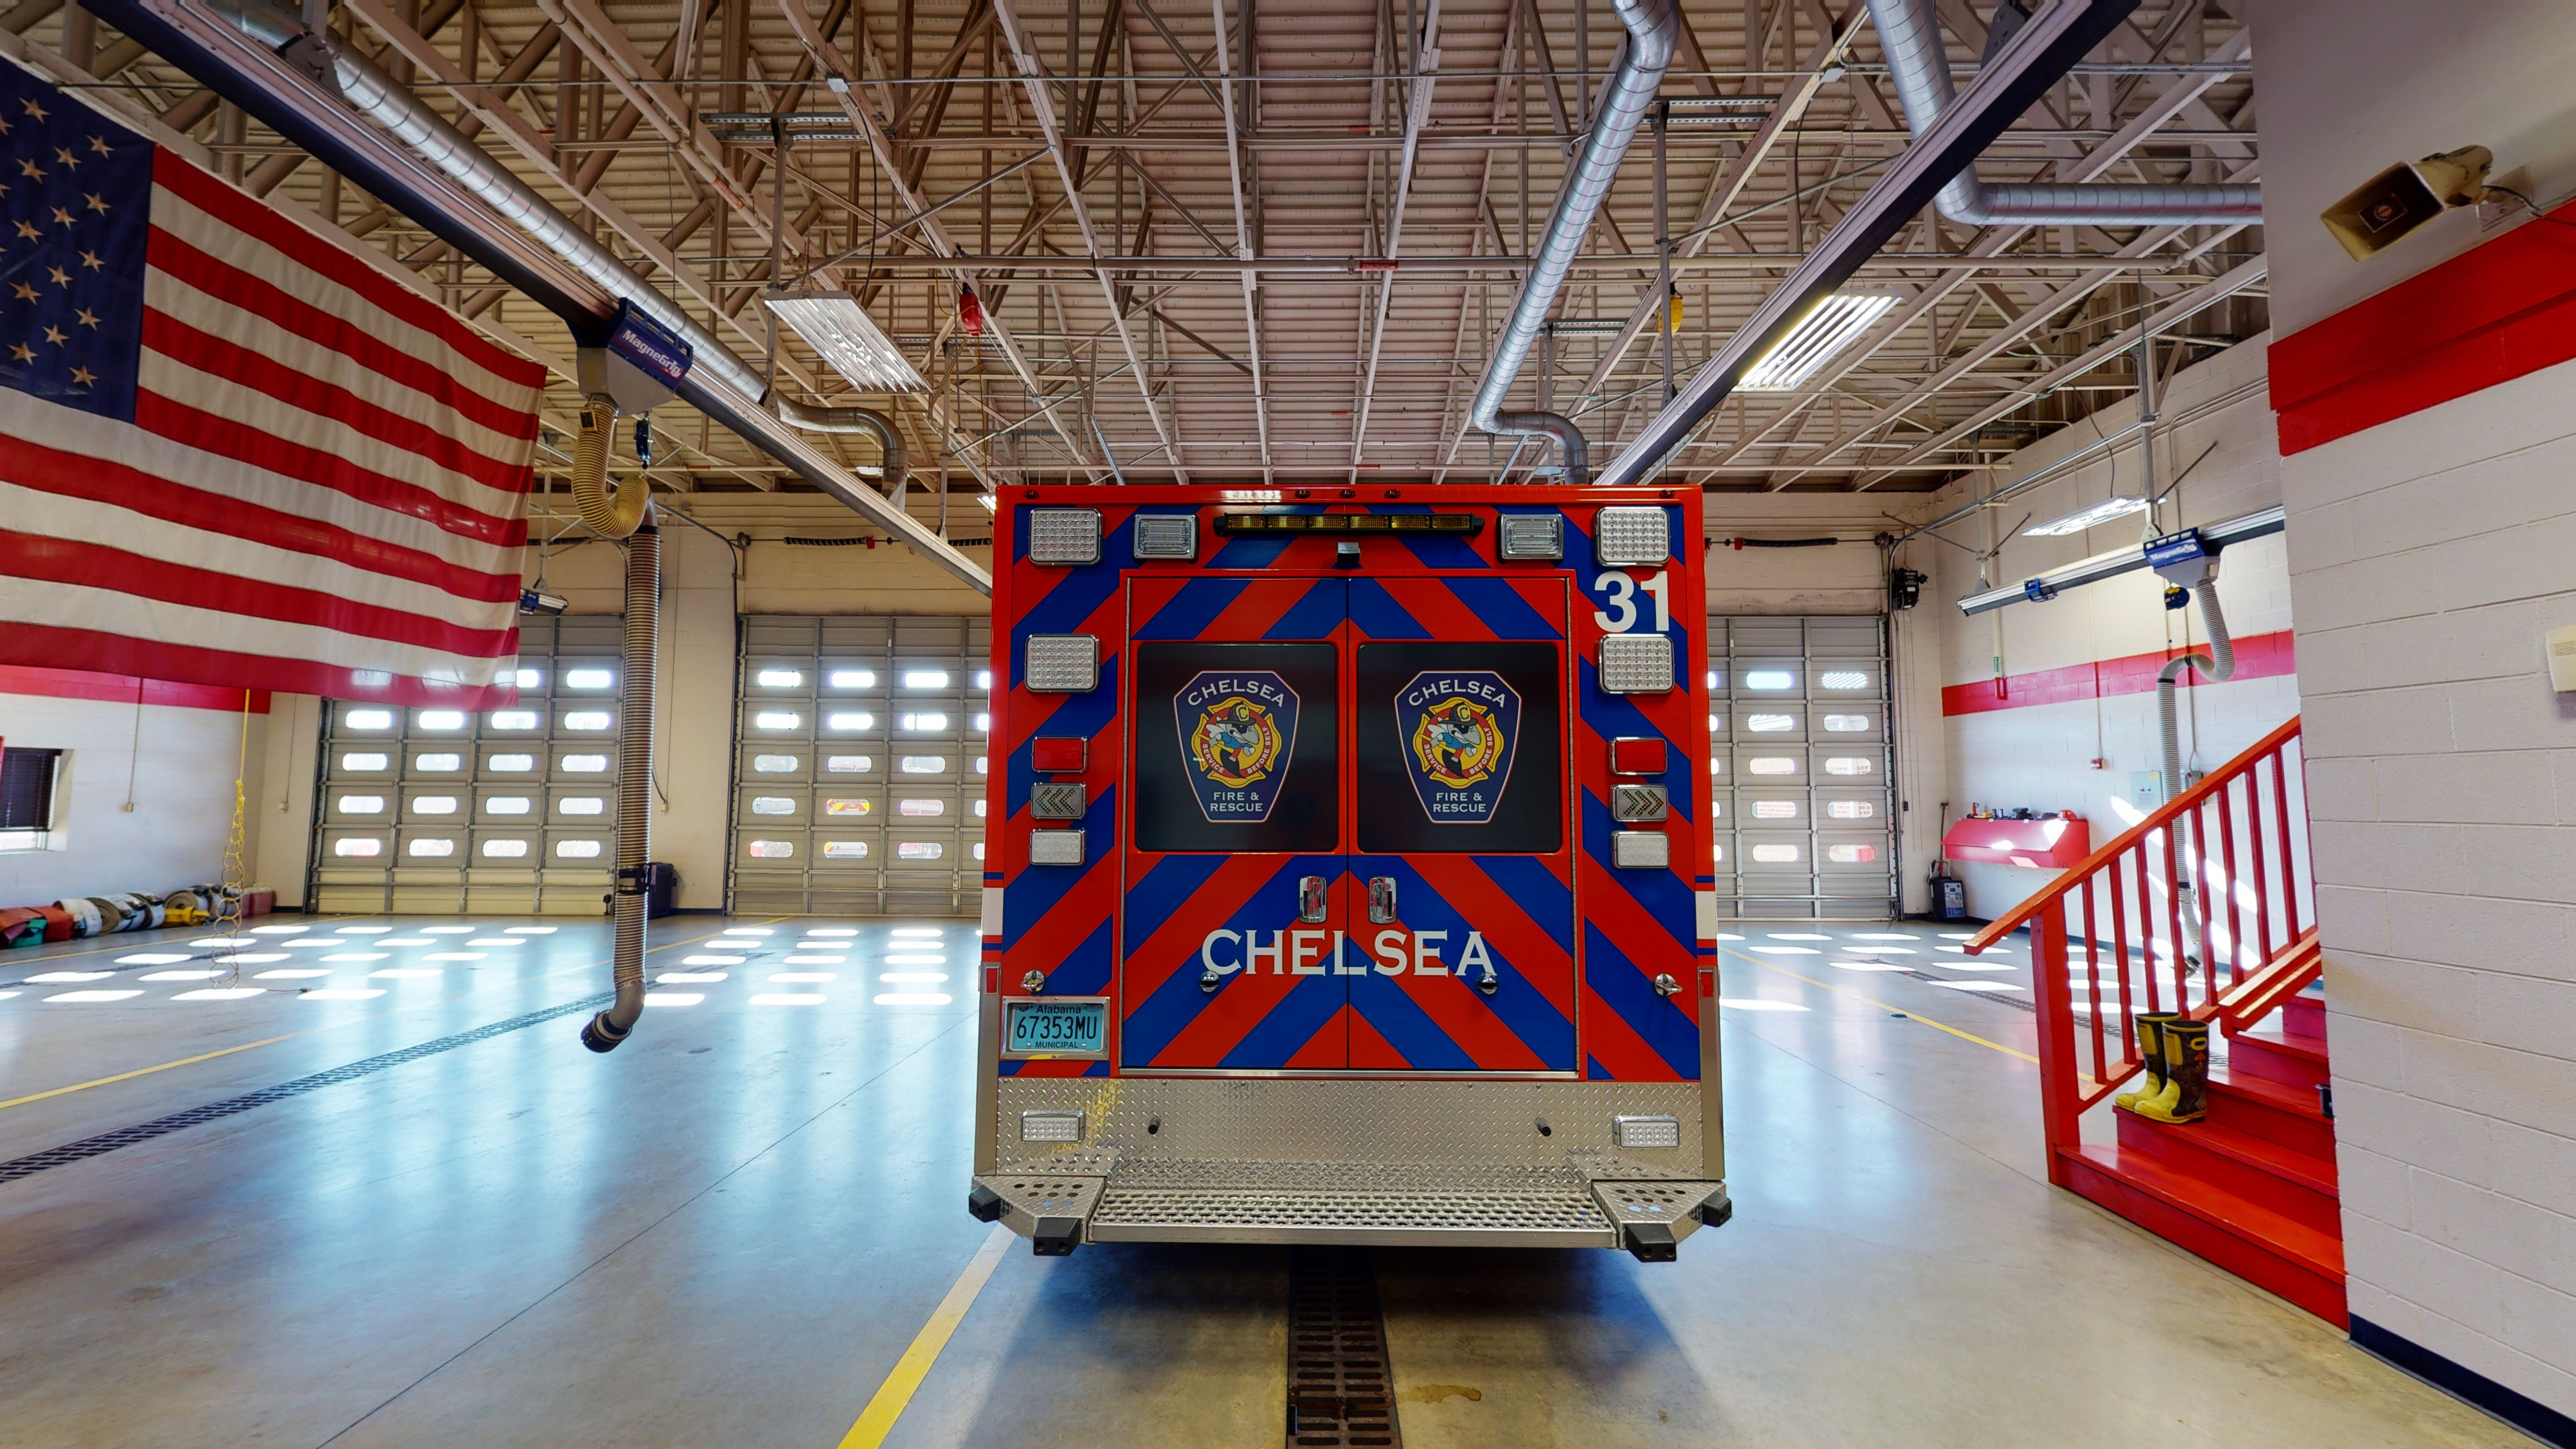 1_Chelsea-Fire-Rescue-Demers-151-06162021_101145